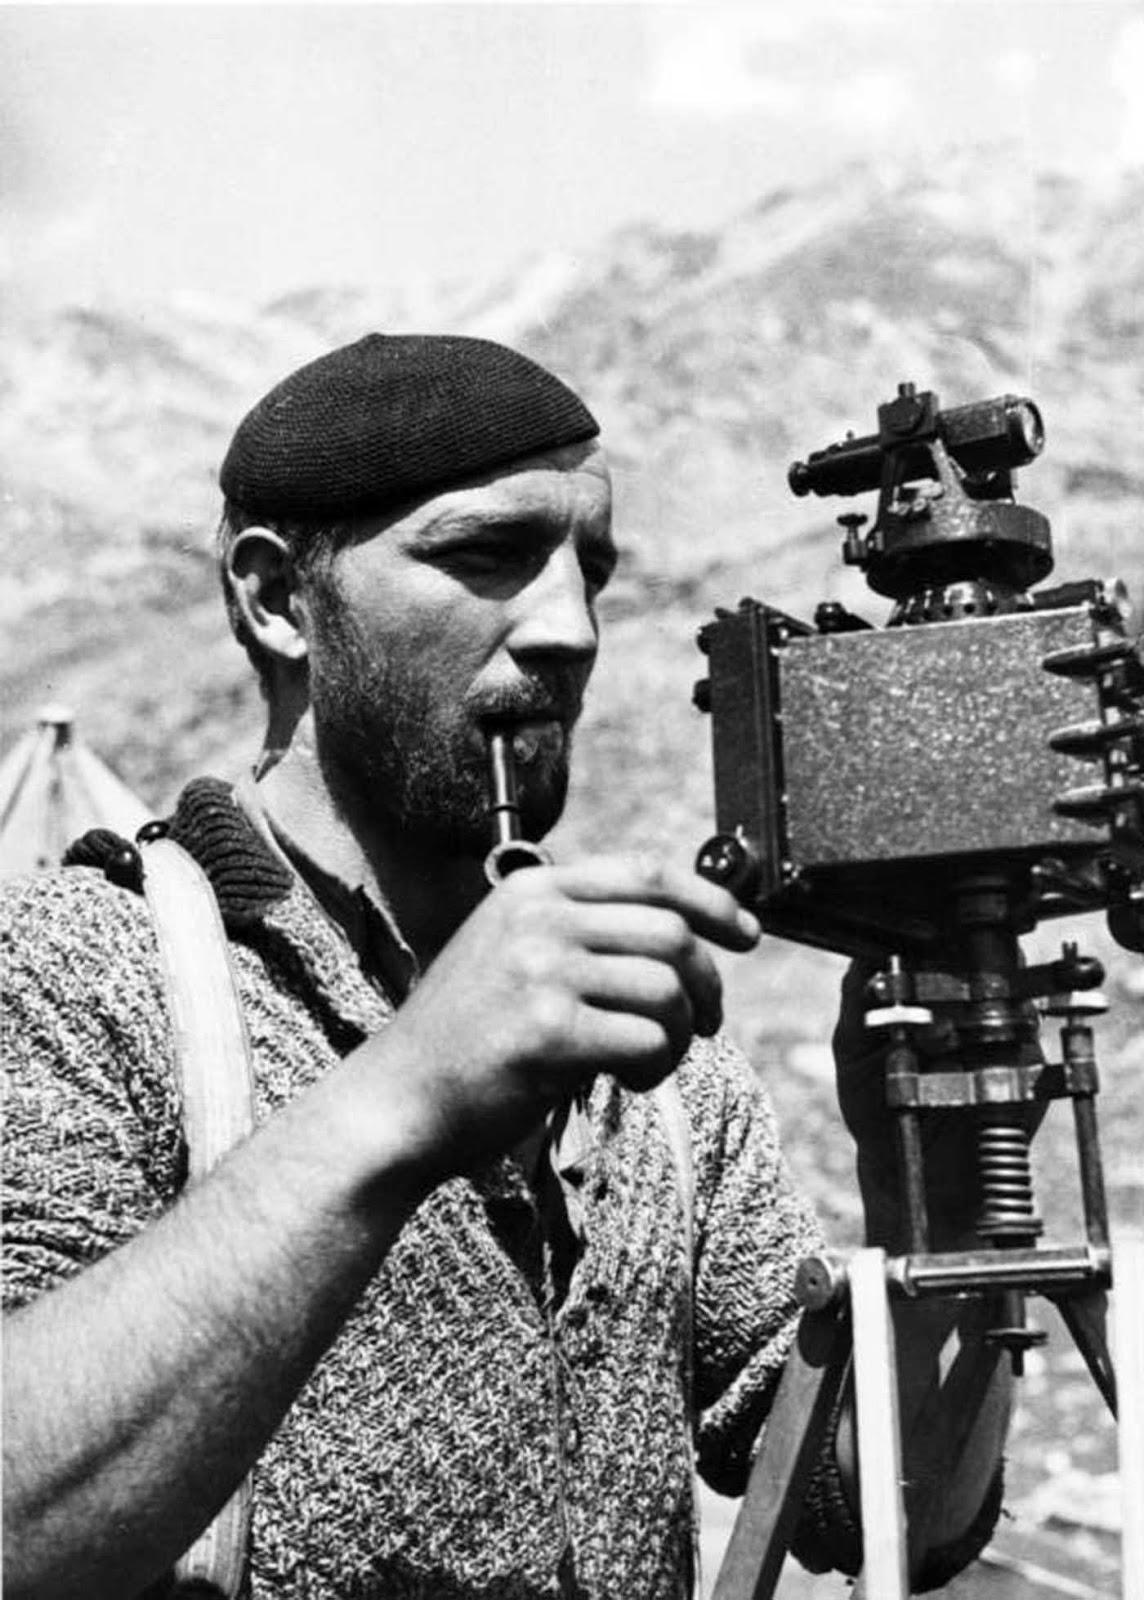 Karl Wienert taking photogrammetric measurements.